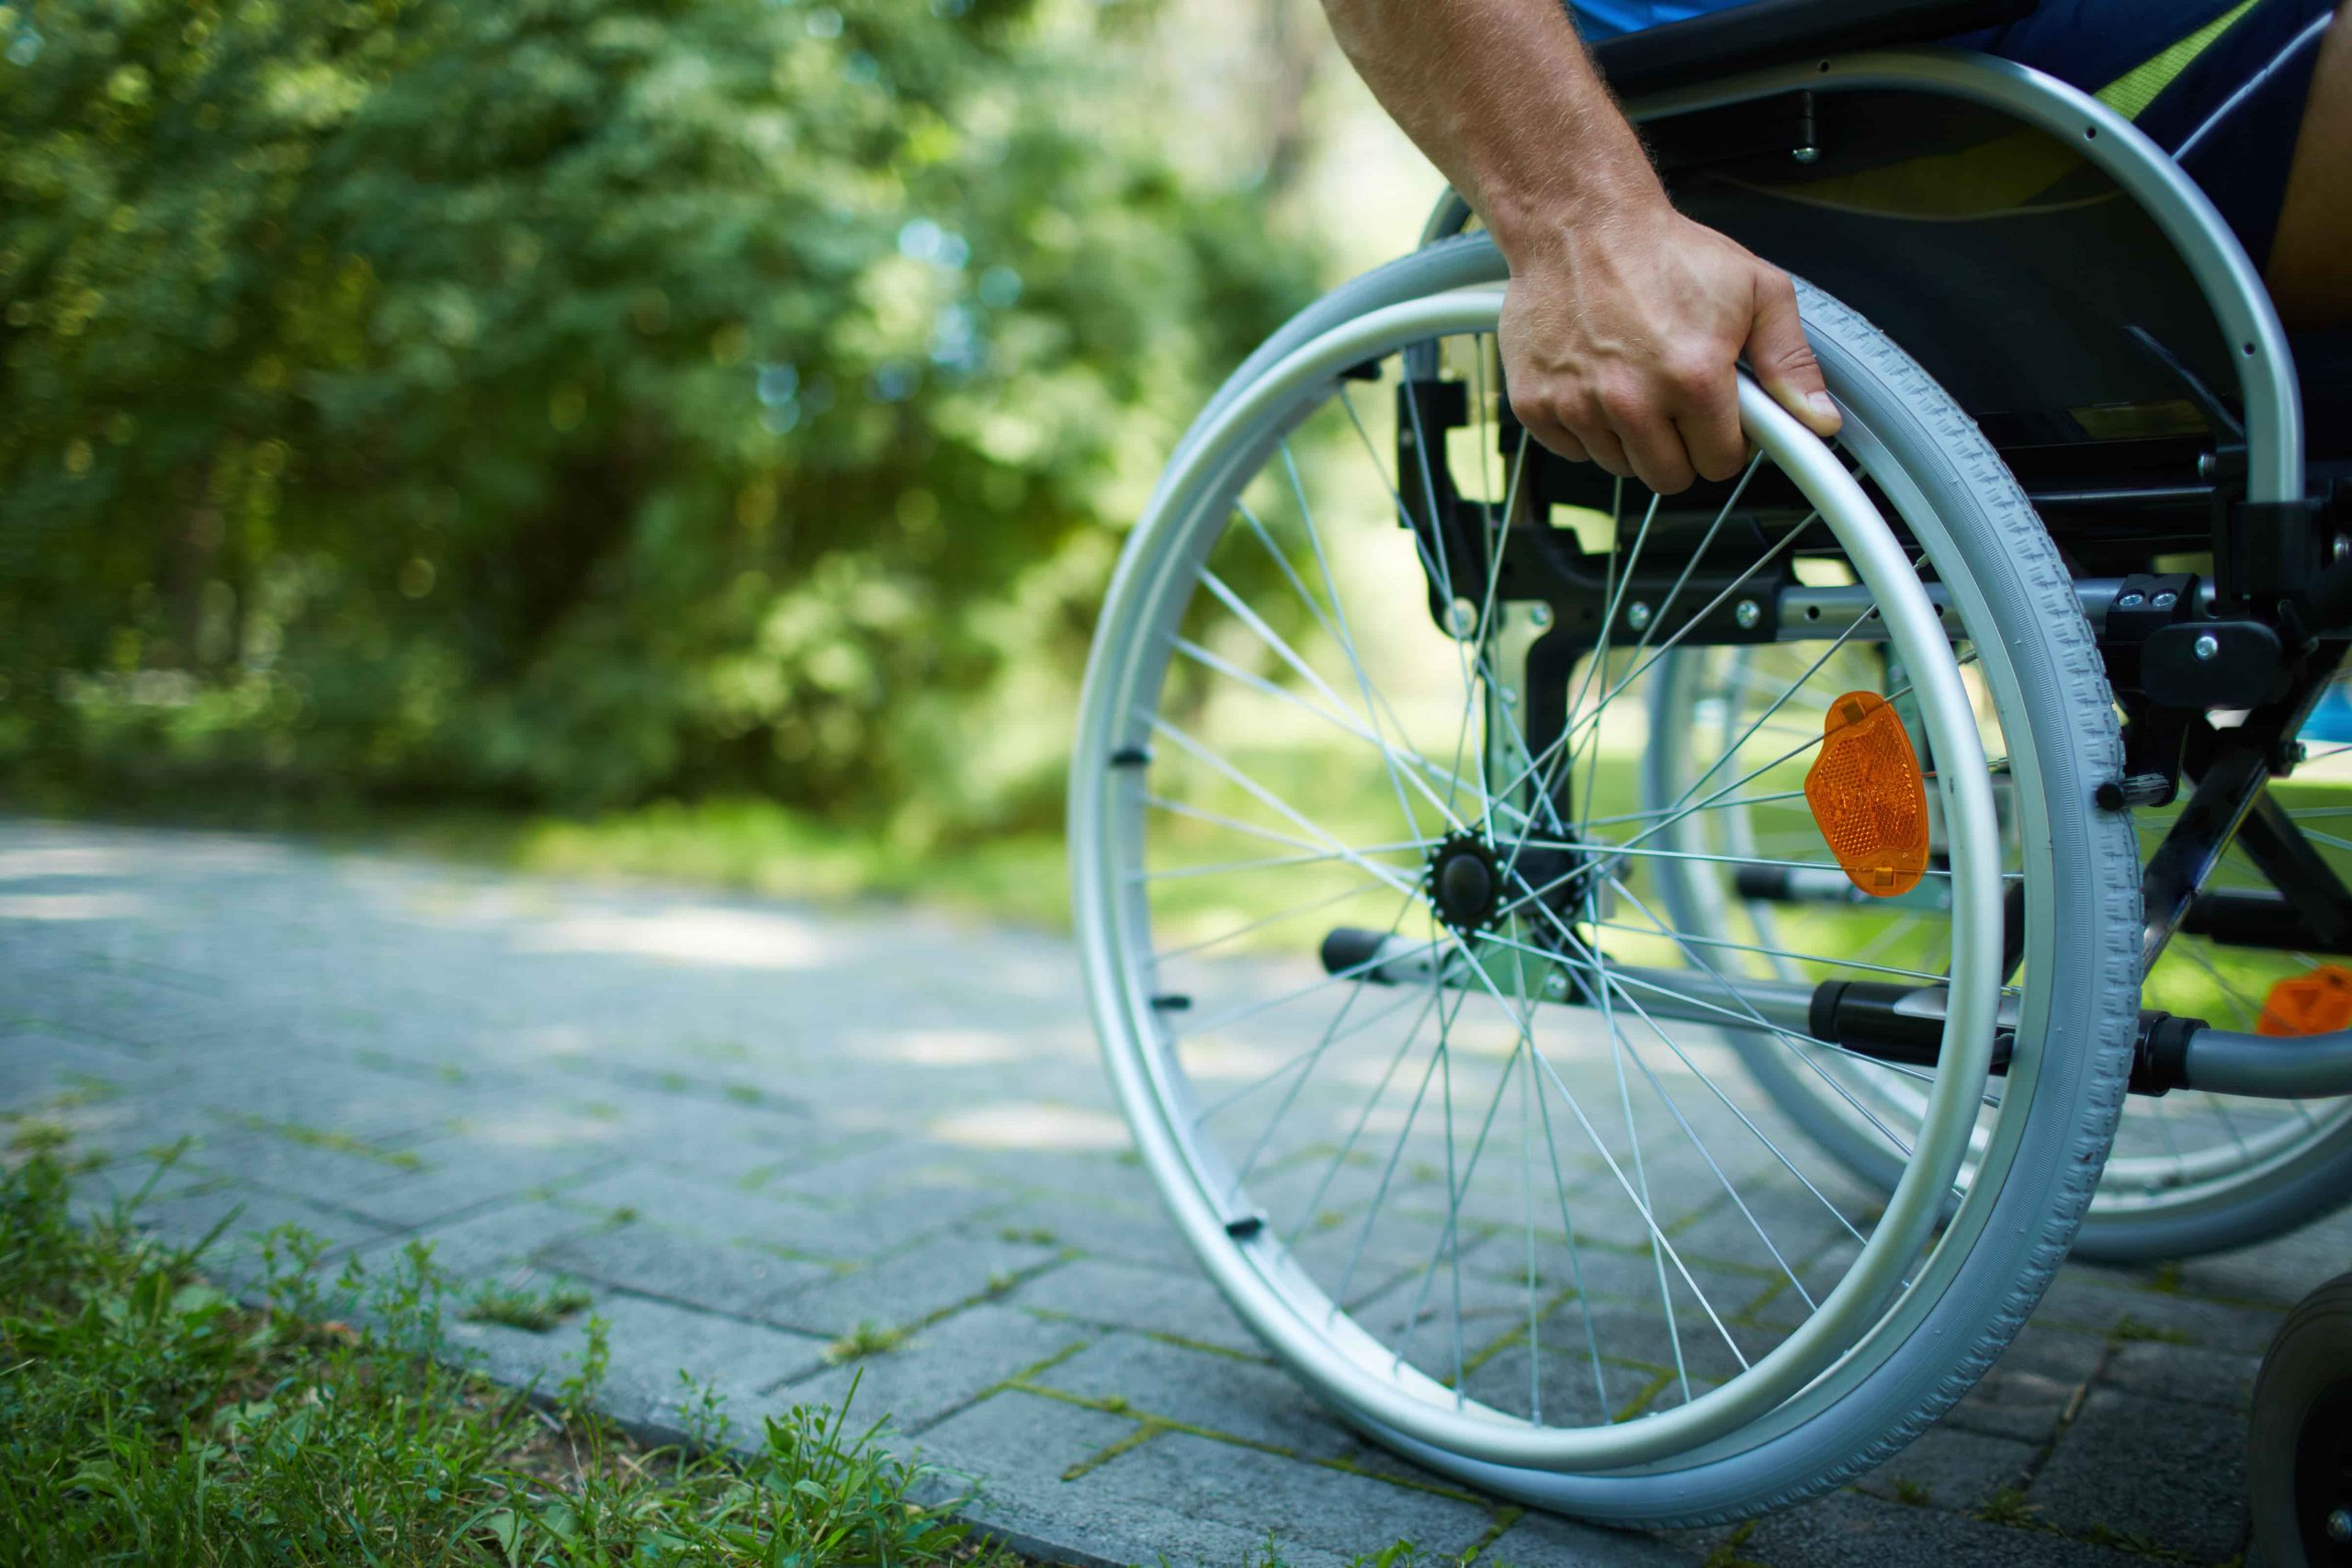 Rouzbeh Pirouz - disabled jobseekers